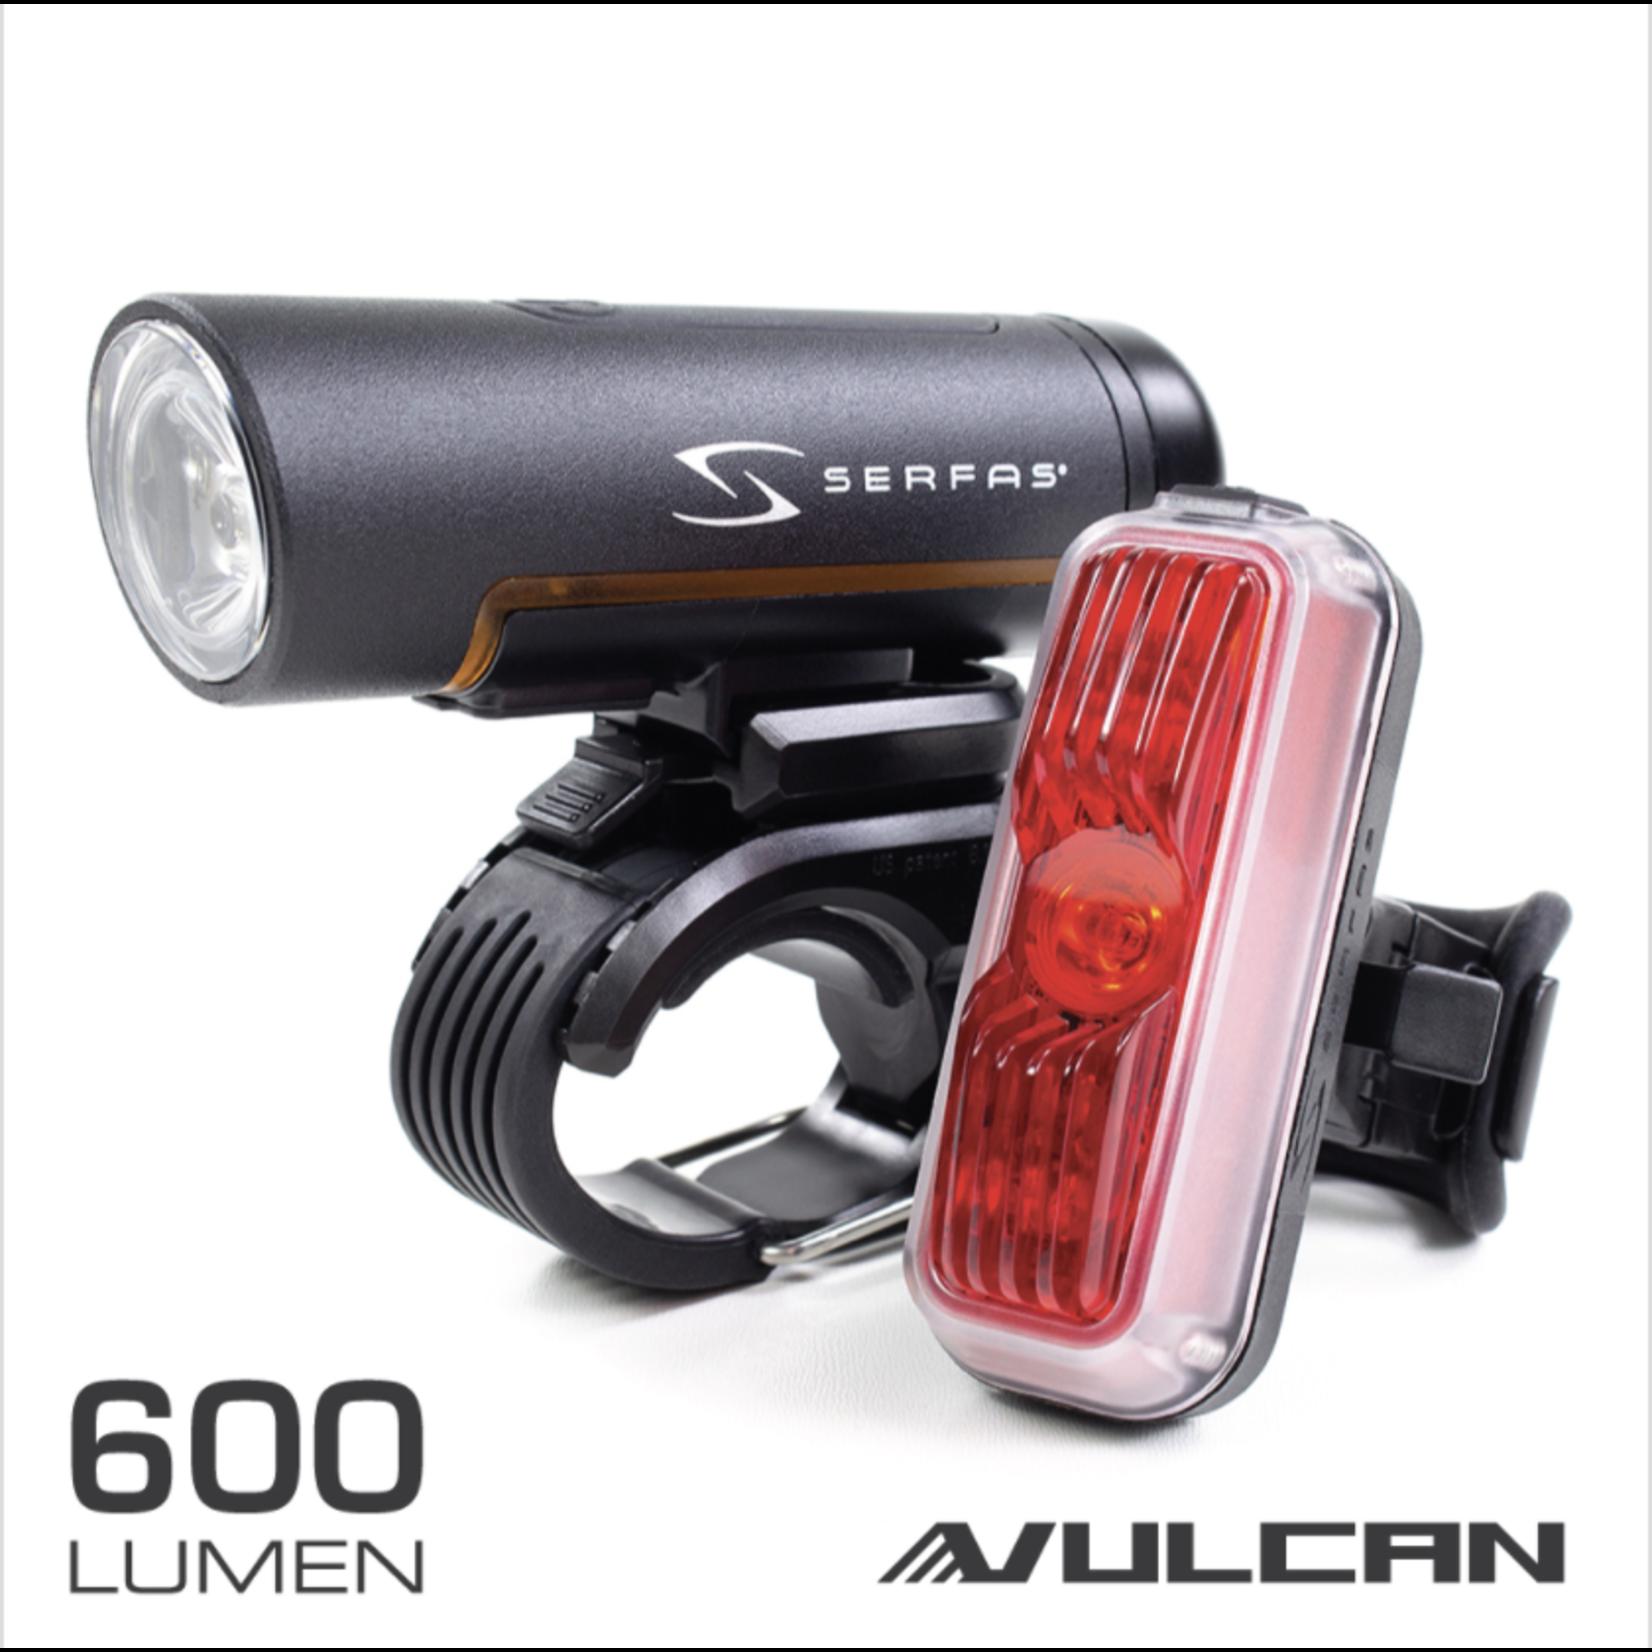 SERFAS UTL-10 APOLLO USB TAIL LIGHT (Serfas)